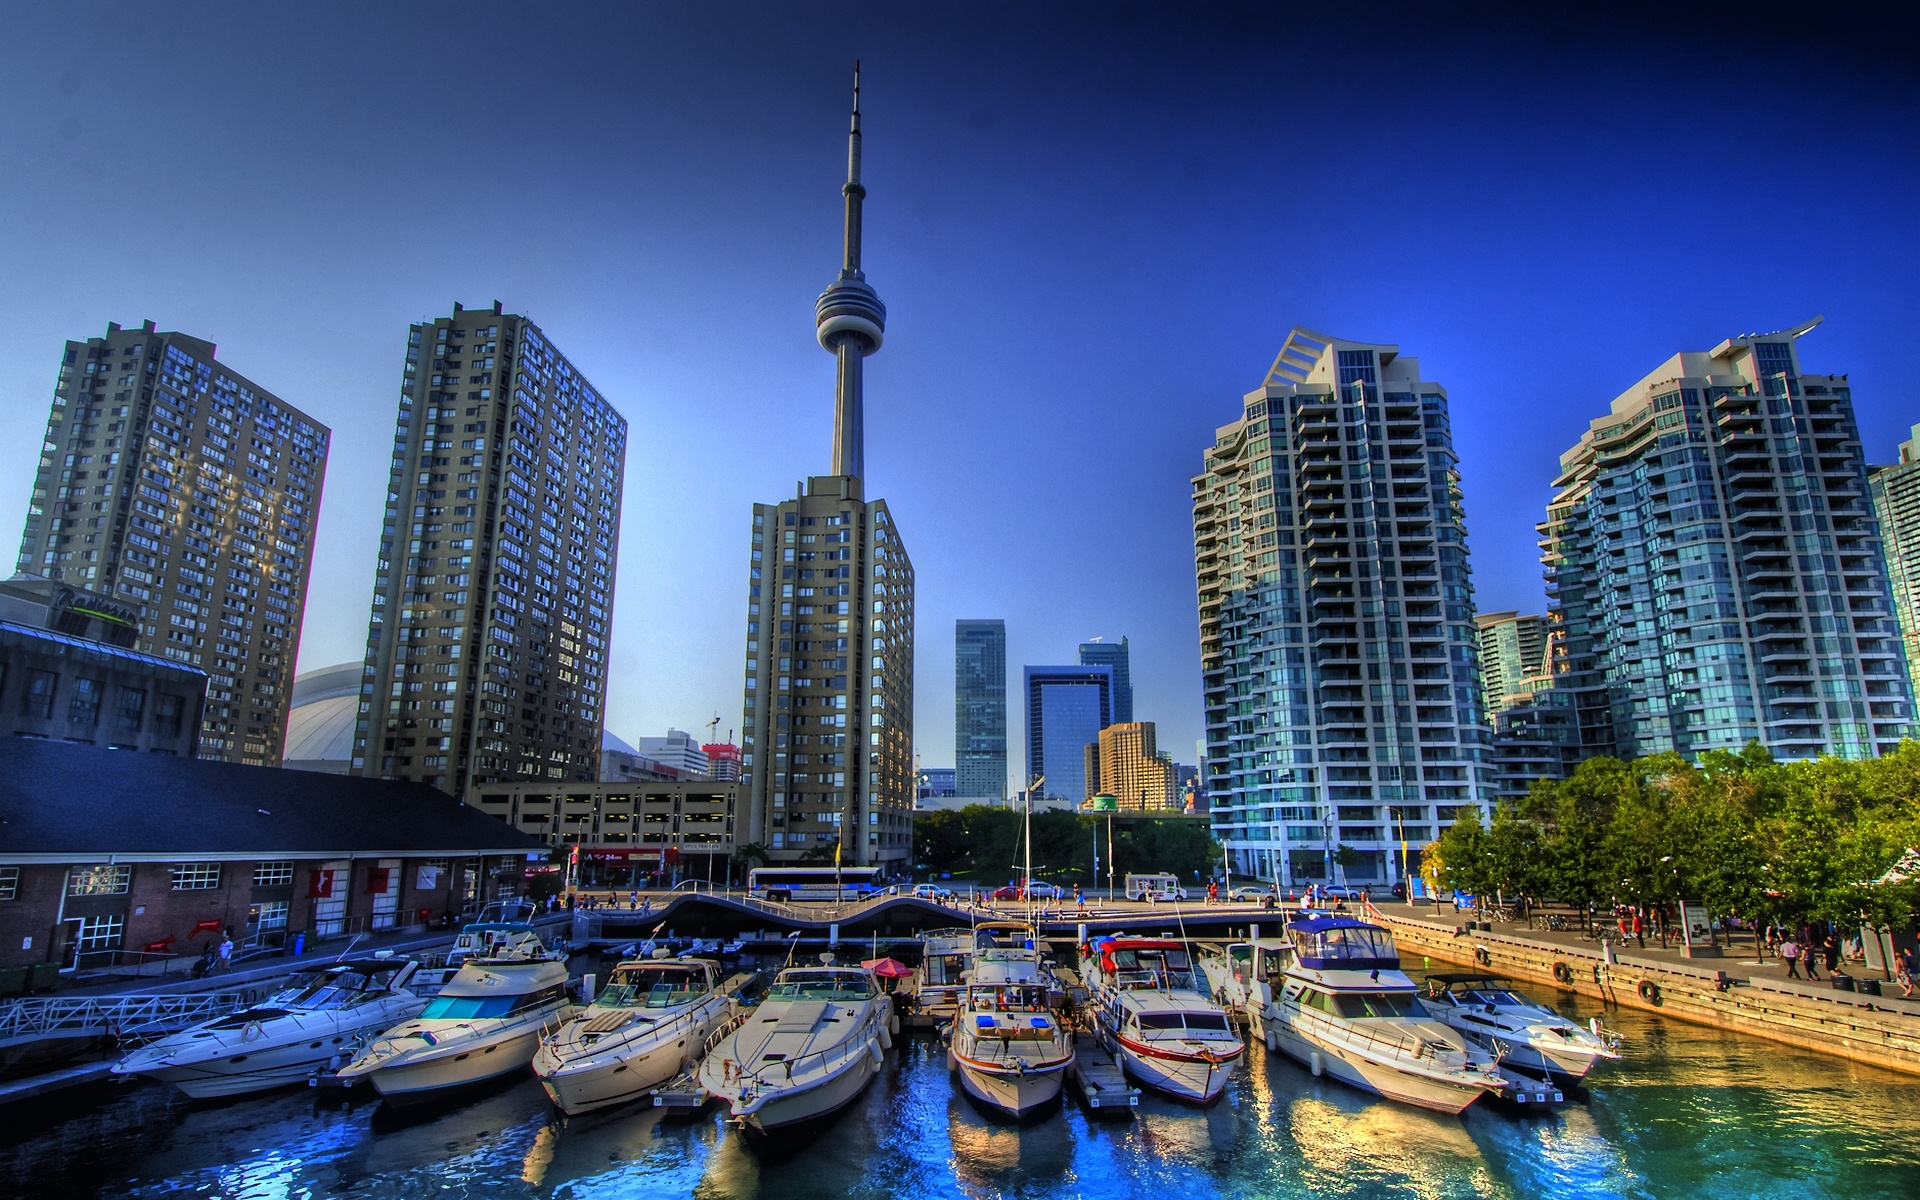 Toronto Canada Harbour Front City HD Wallpaper 5328 HD Wallpaper 1920x1200